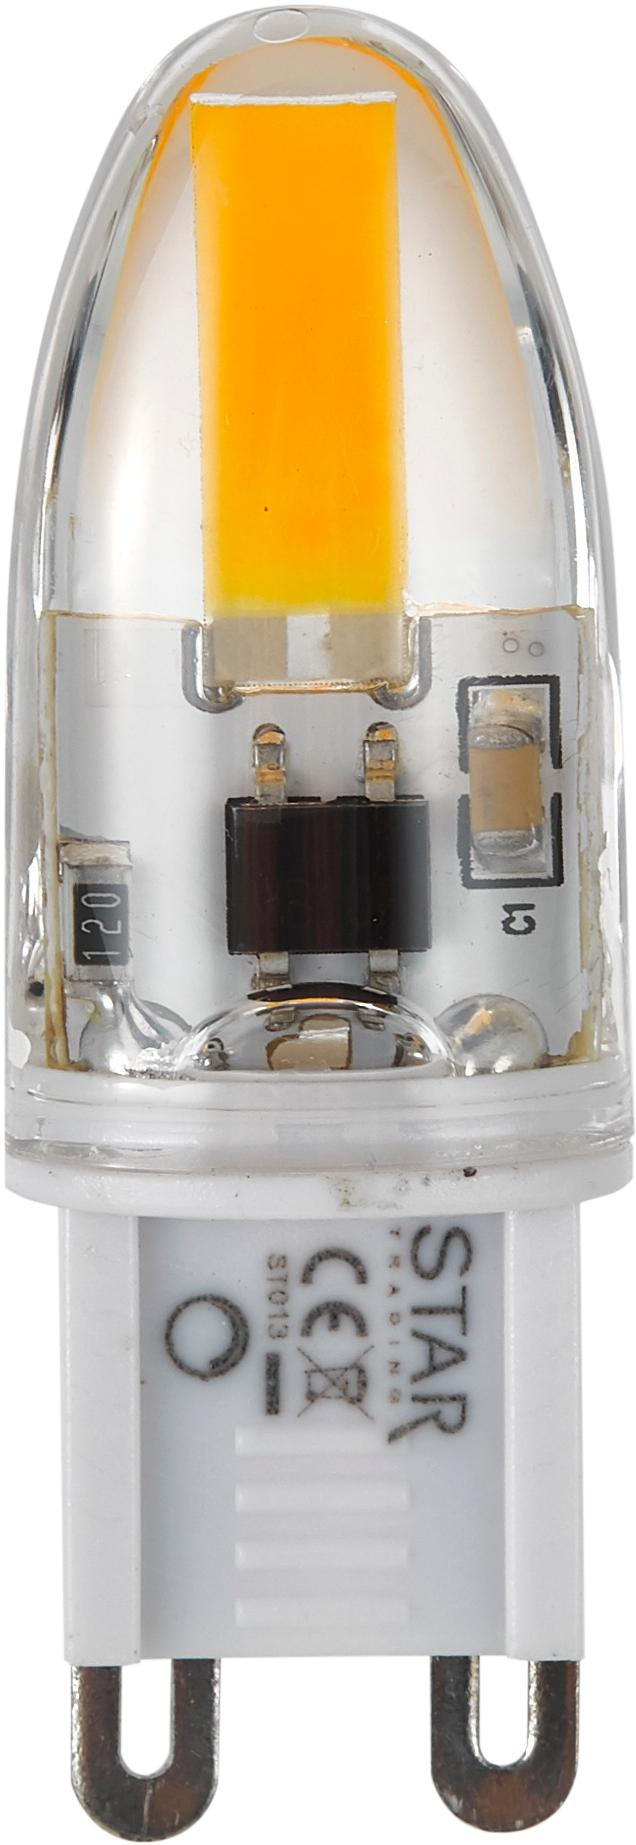 LED peertjes Halo (G9/1,6W) 5stuks, Glas, Transparant, 2 x 5 cm